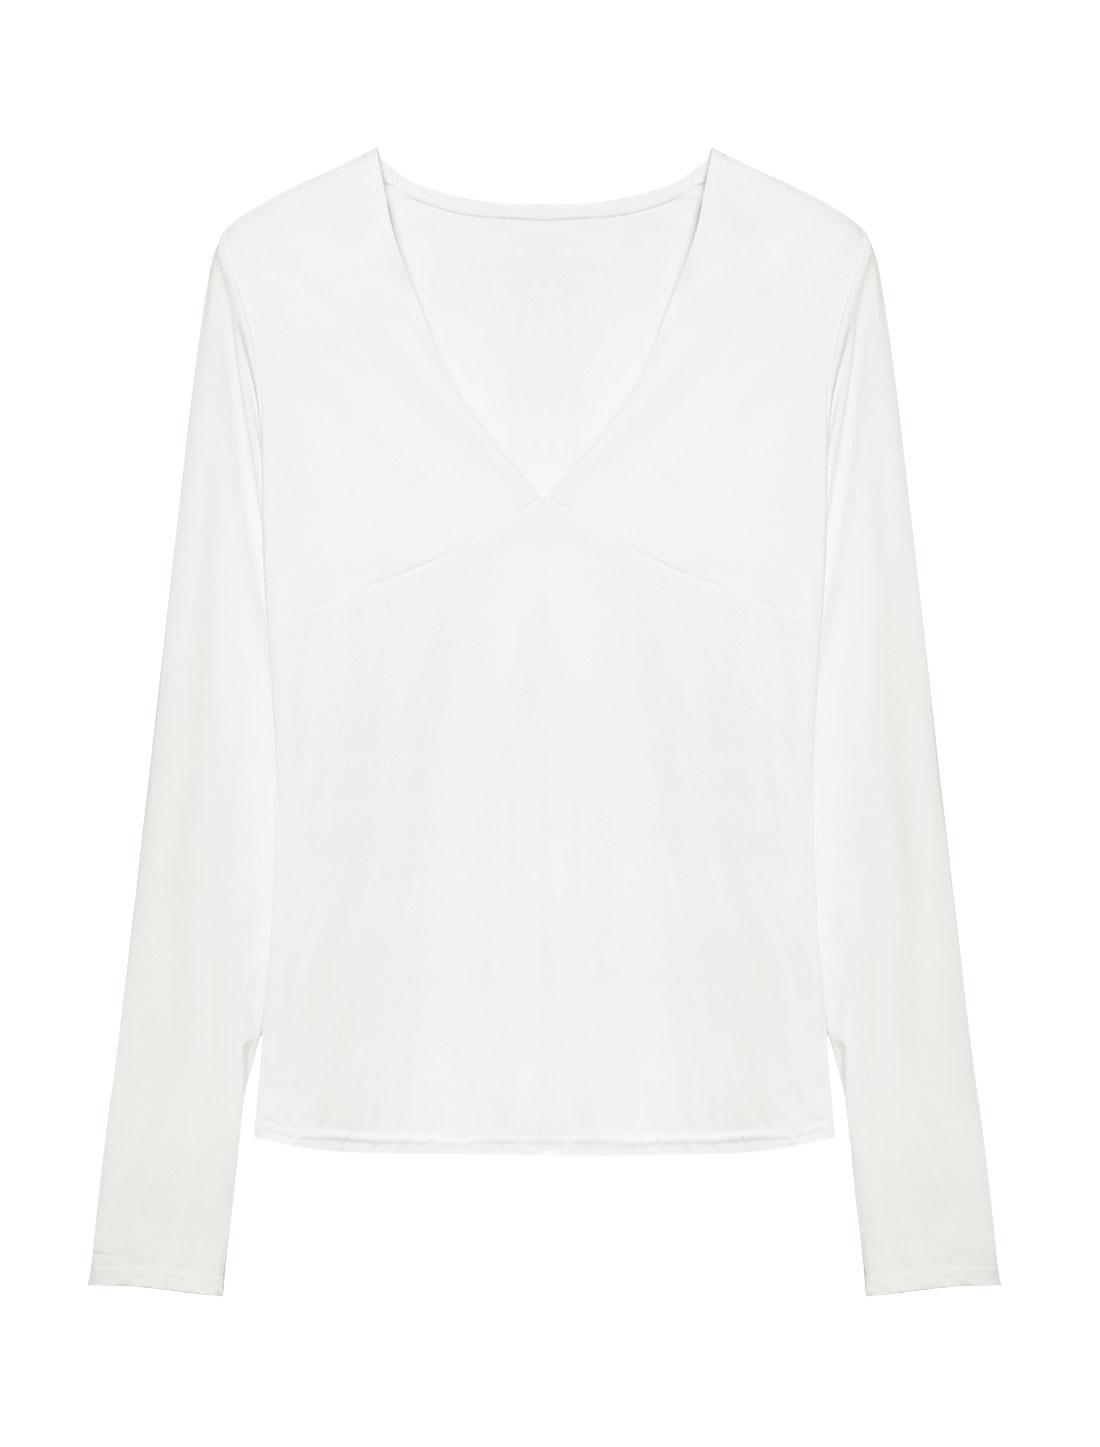 Women Deep V Neck Long Sleeves Stretchy Slim Fit Shirt White S